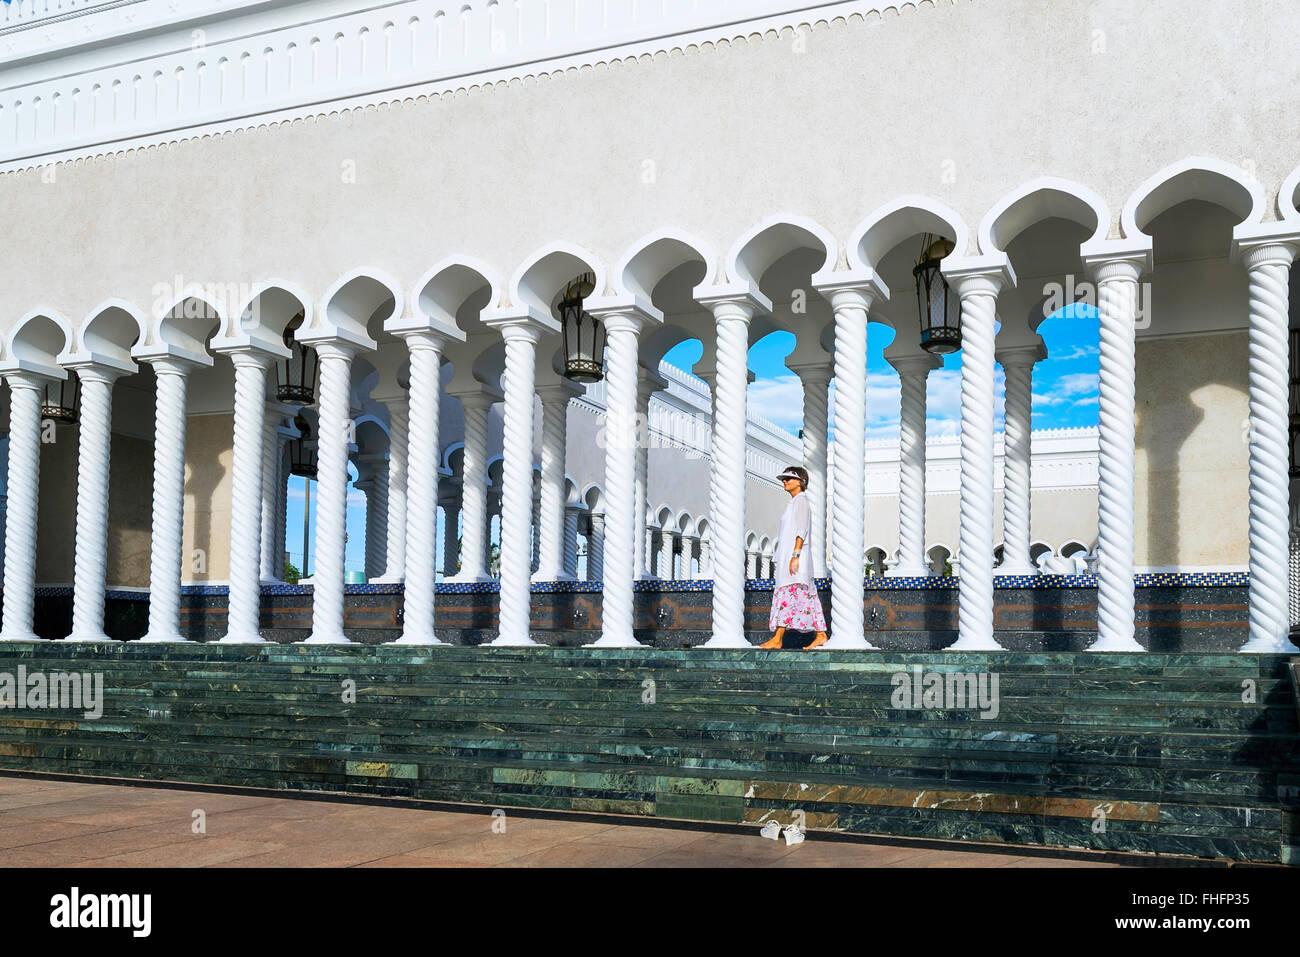 Woman walking on Sultan Omar Ali Saifuddin Mosque in Brunei - Stock Image